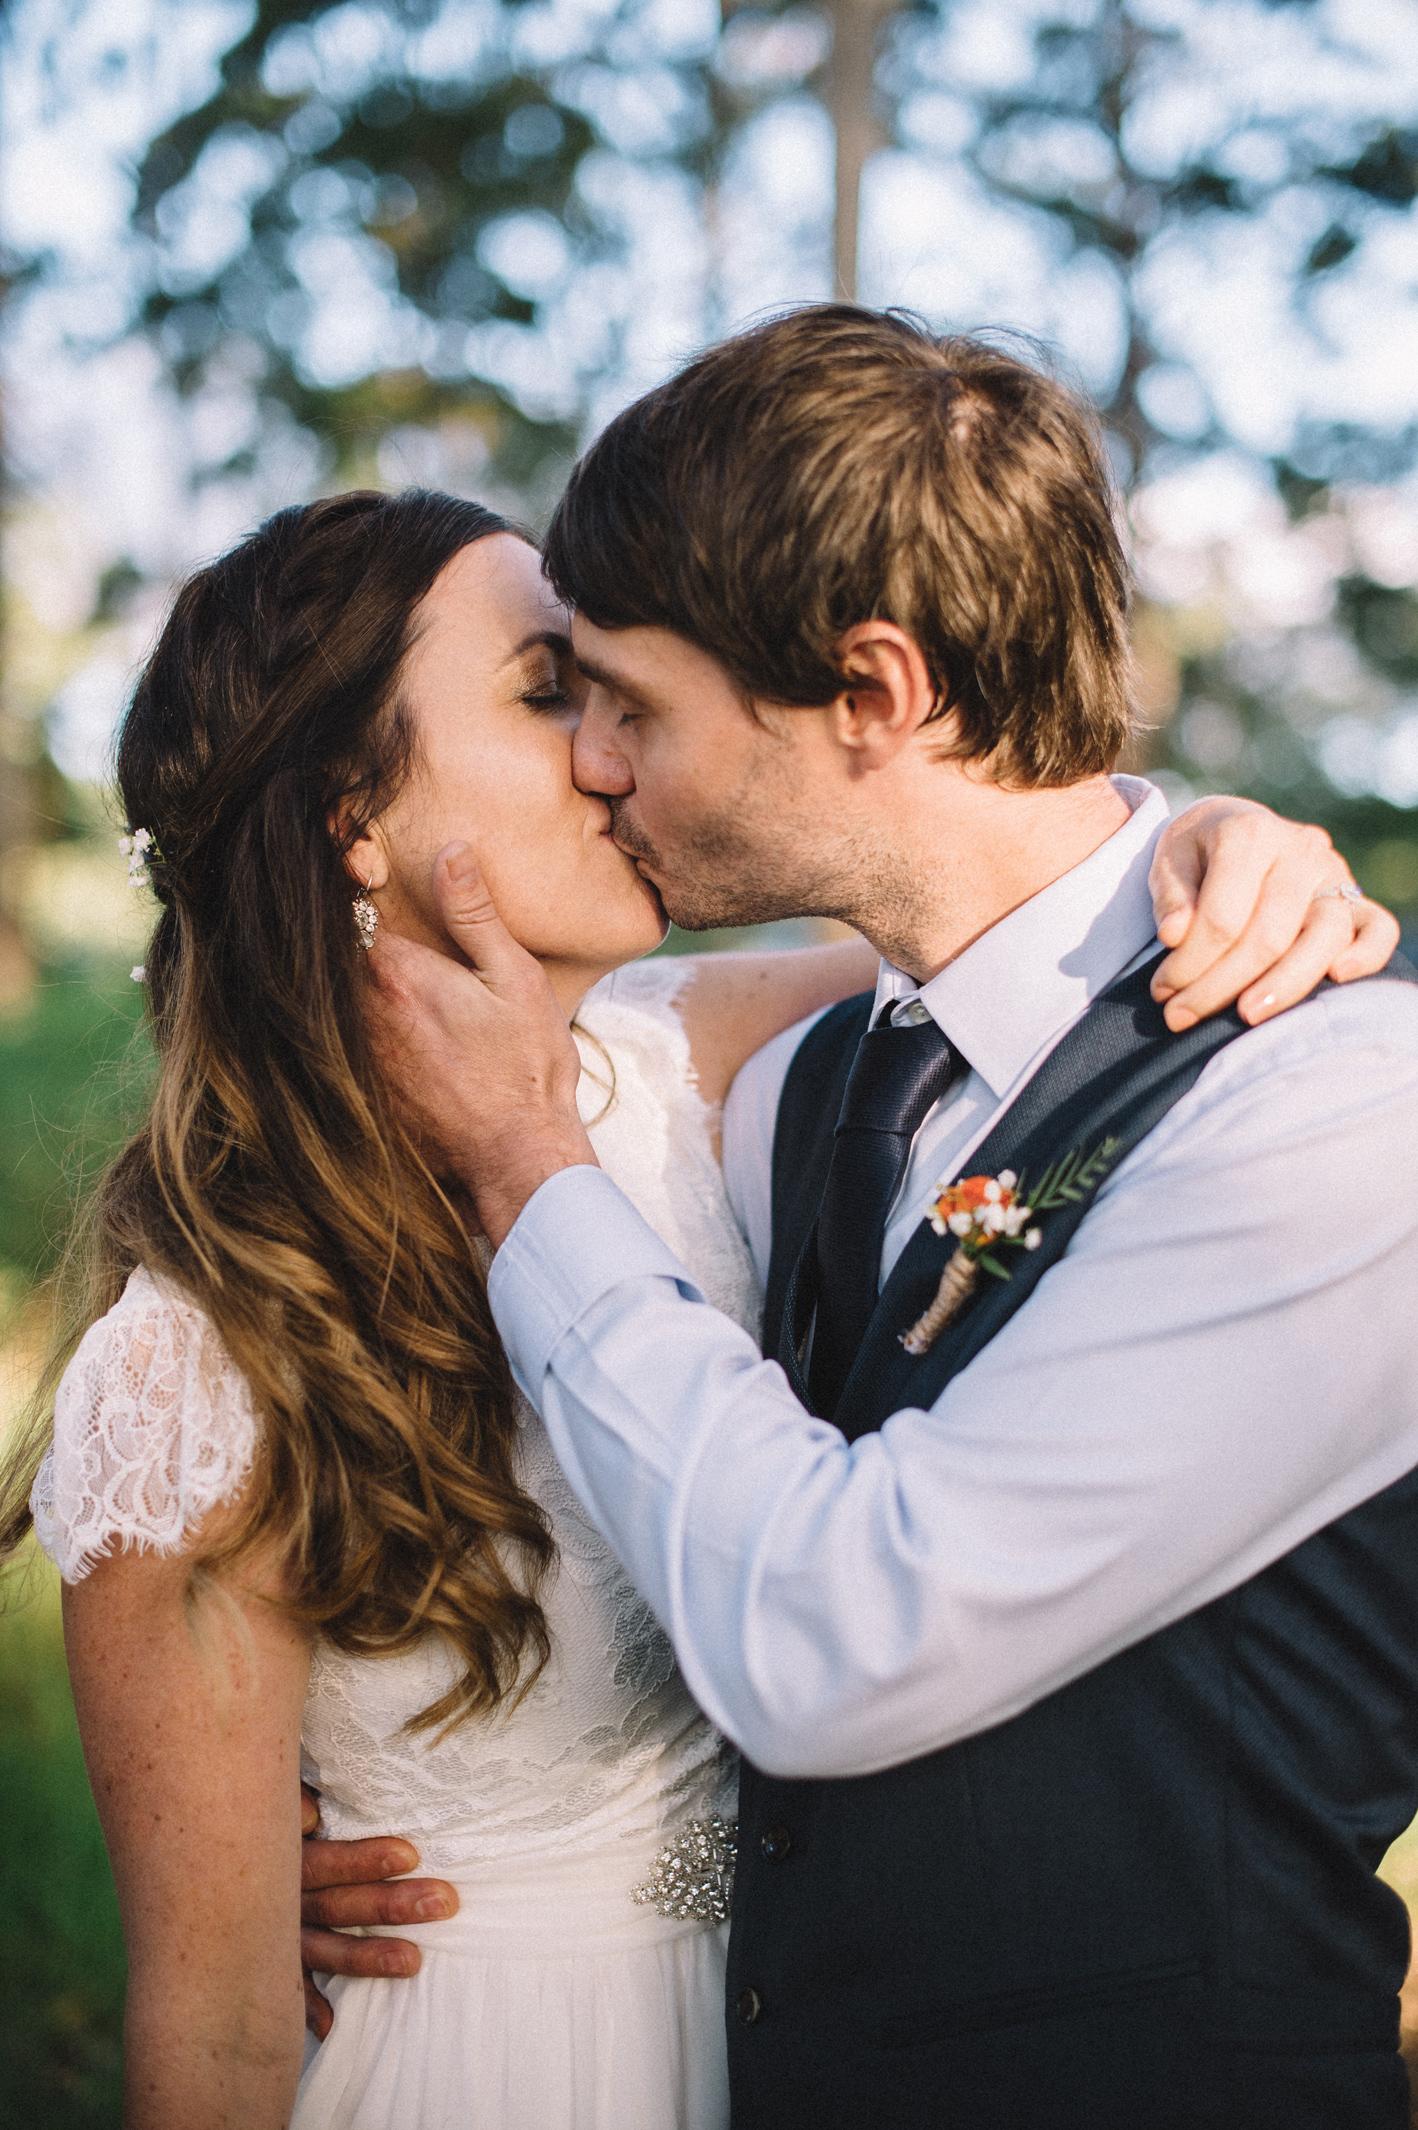 059-michelle-reagan-mount-tamborine-wedding-sophie-baker-photography